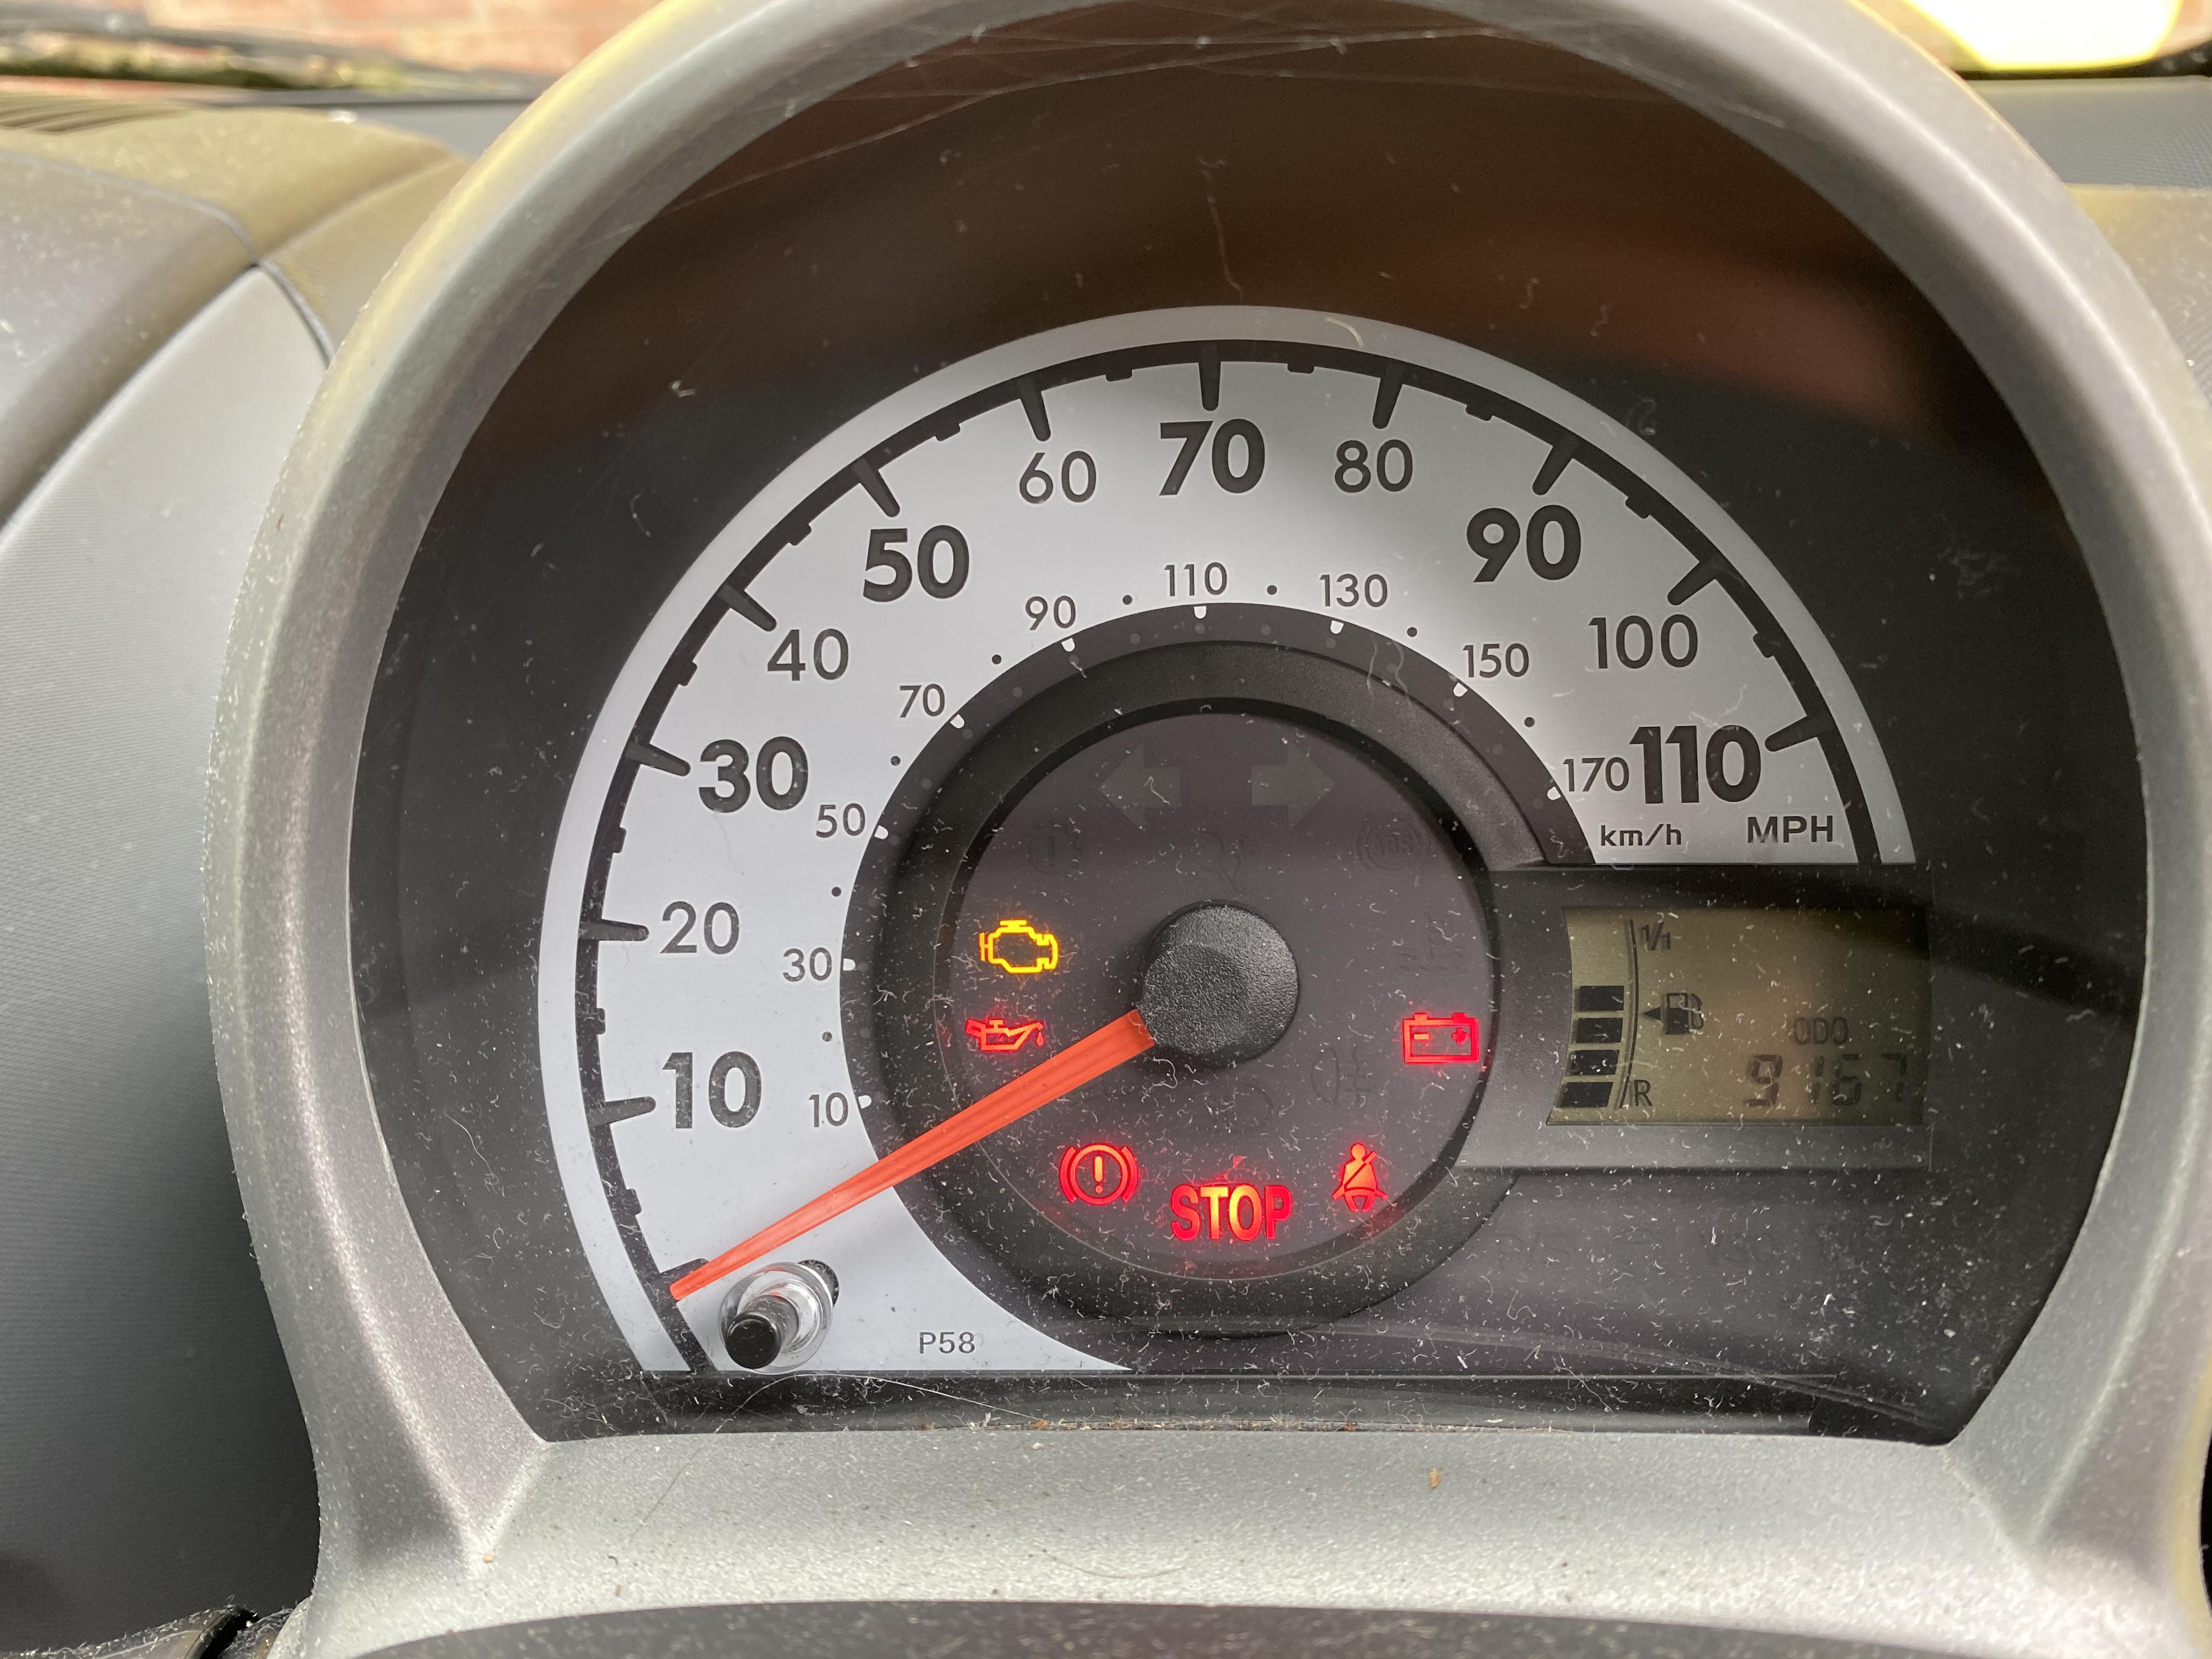 [MA61 KPU] 2011 Peugeot 107 1.0 Urban Lite 3-door hatchback in Yellow, 9,167 Miles, MOT expired - Image 4 of 7